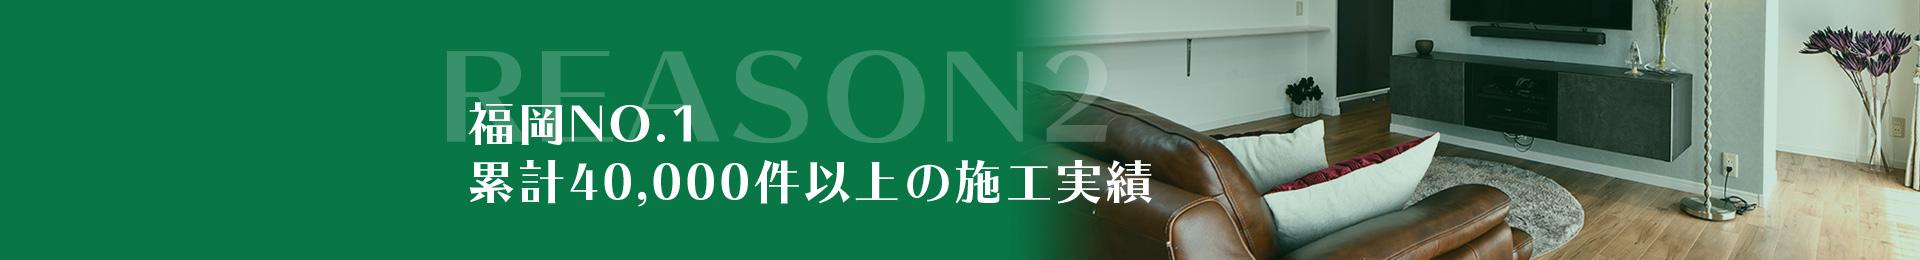 REASON2福岡No.1累計40,000件以上の施工実績